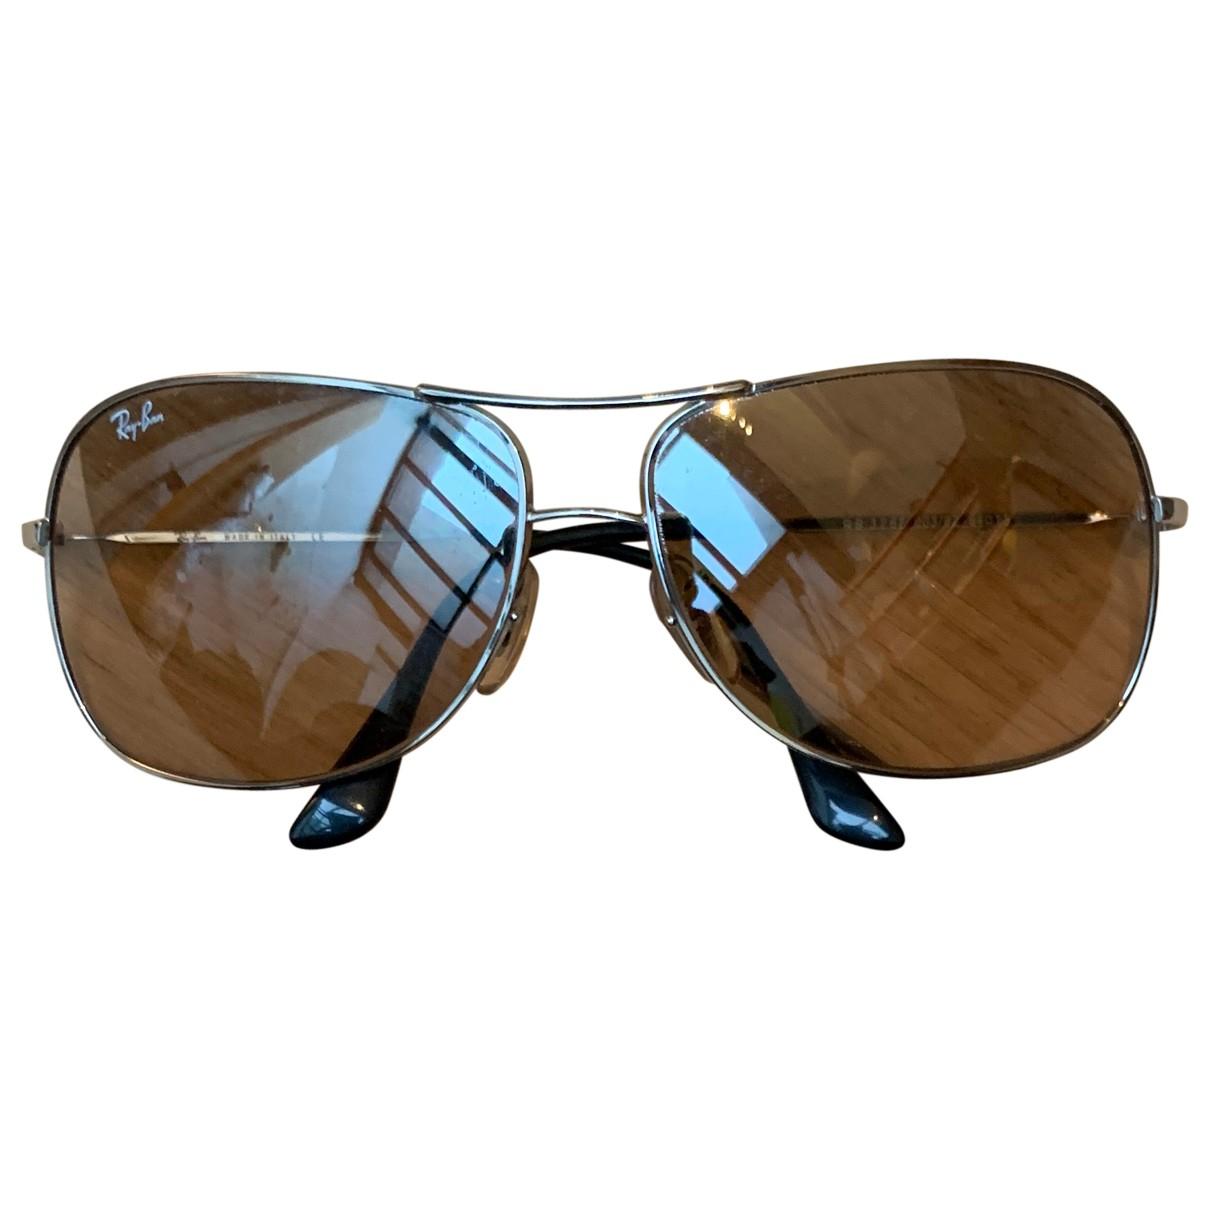 Ray-ban Aviator Silver Metal Sunglasses for Women N